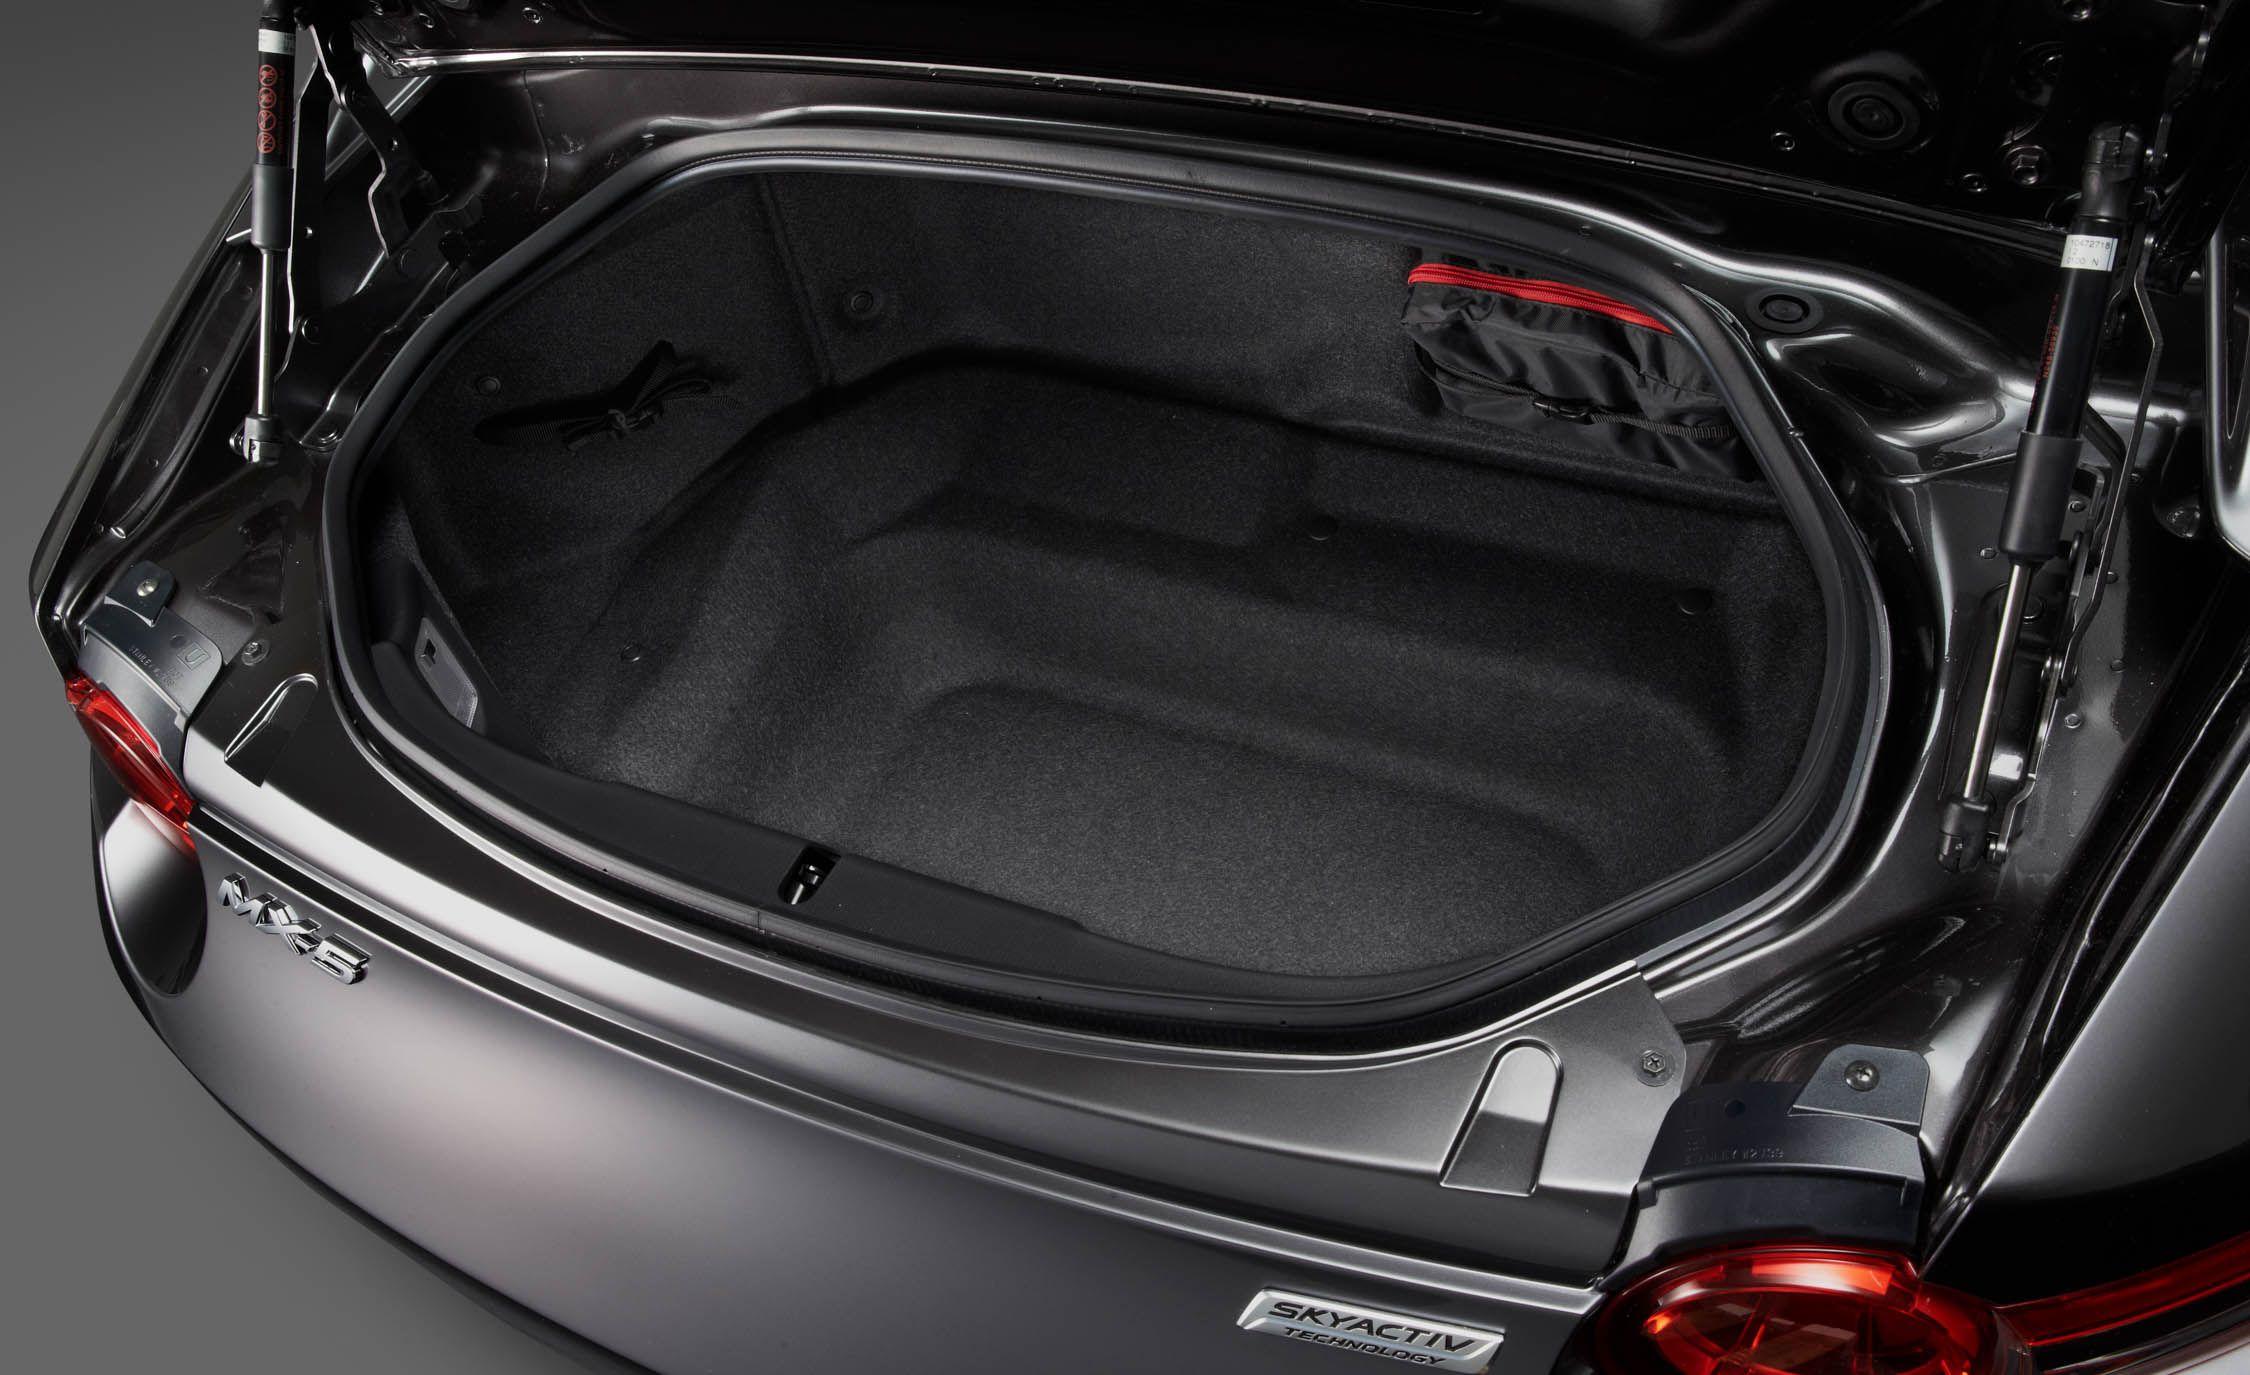 2019 Mazda Mx 5 Miata Reviews Price Photos And Specs Car Driver